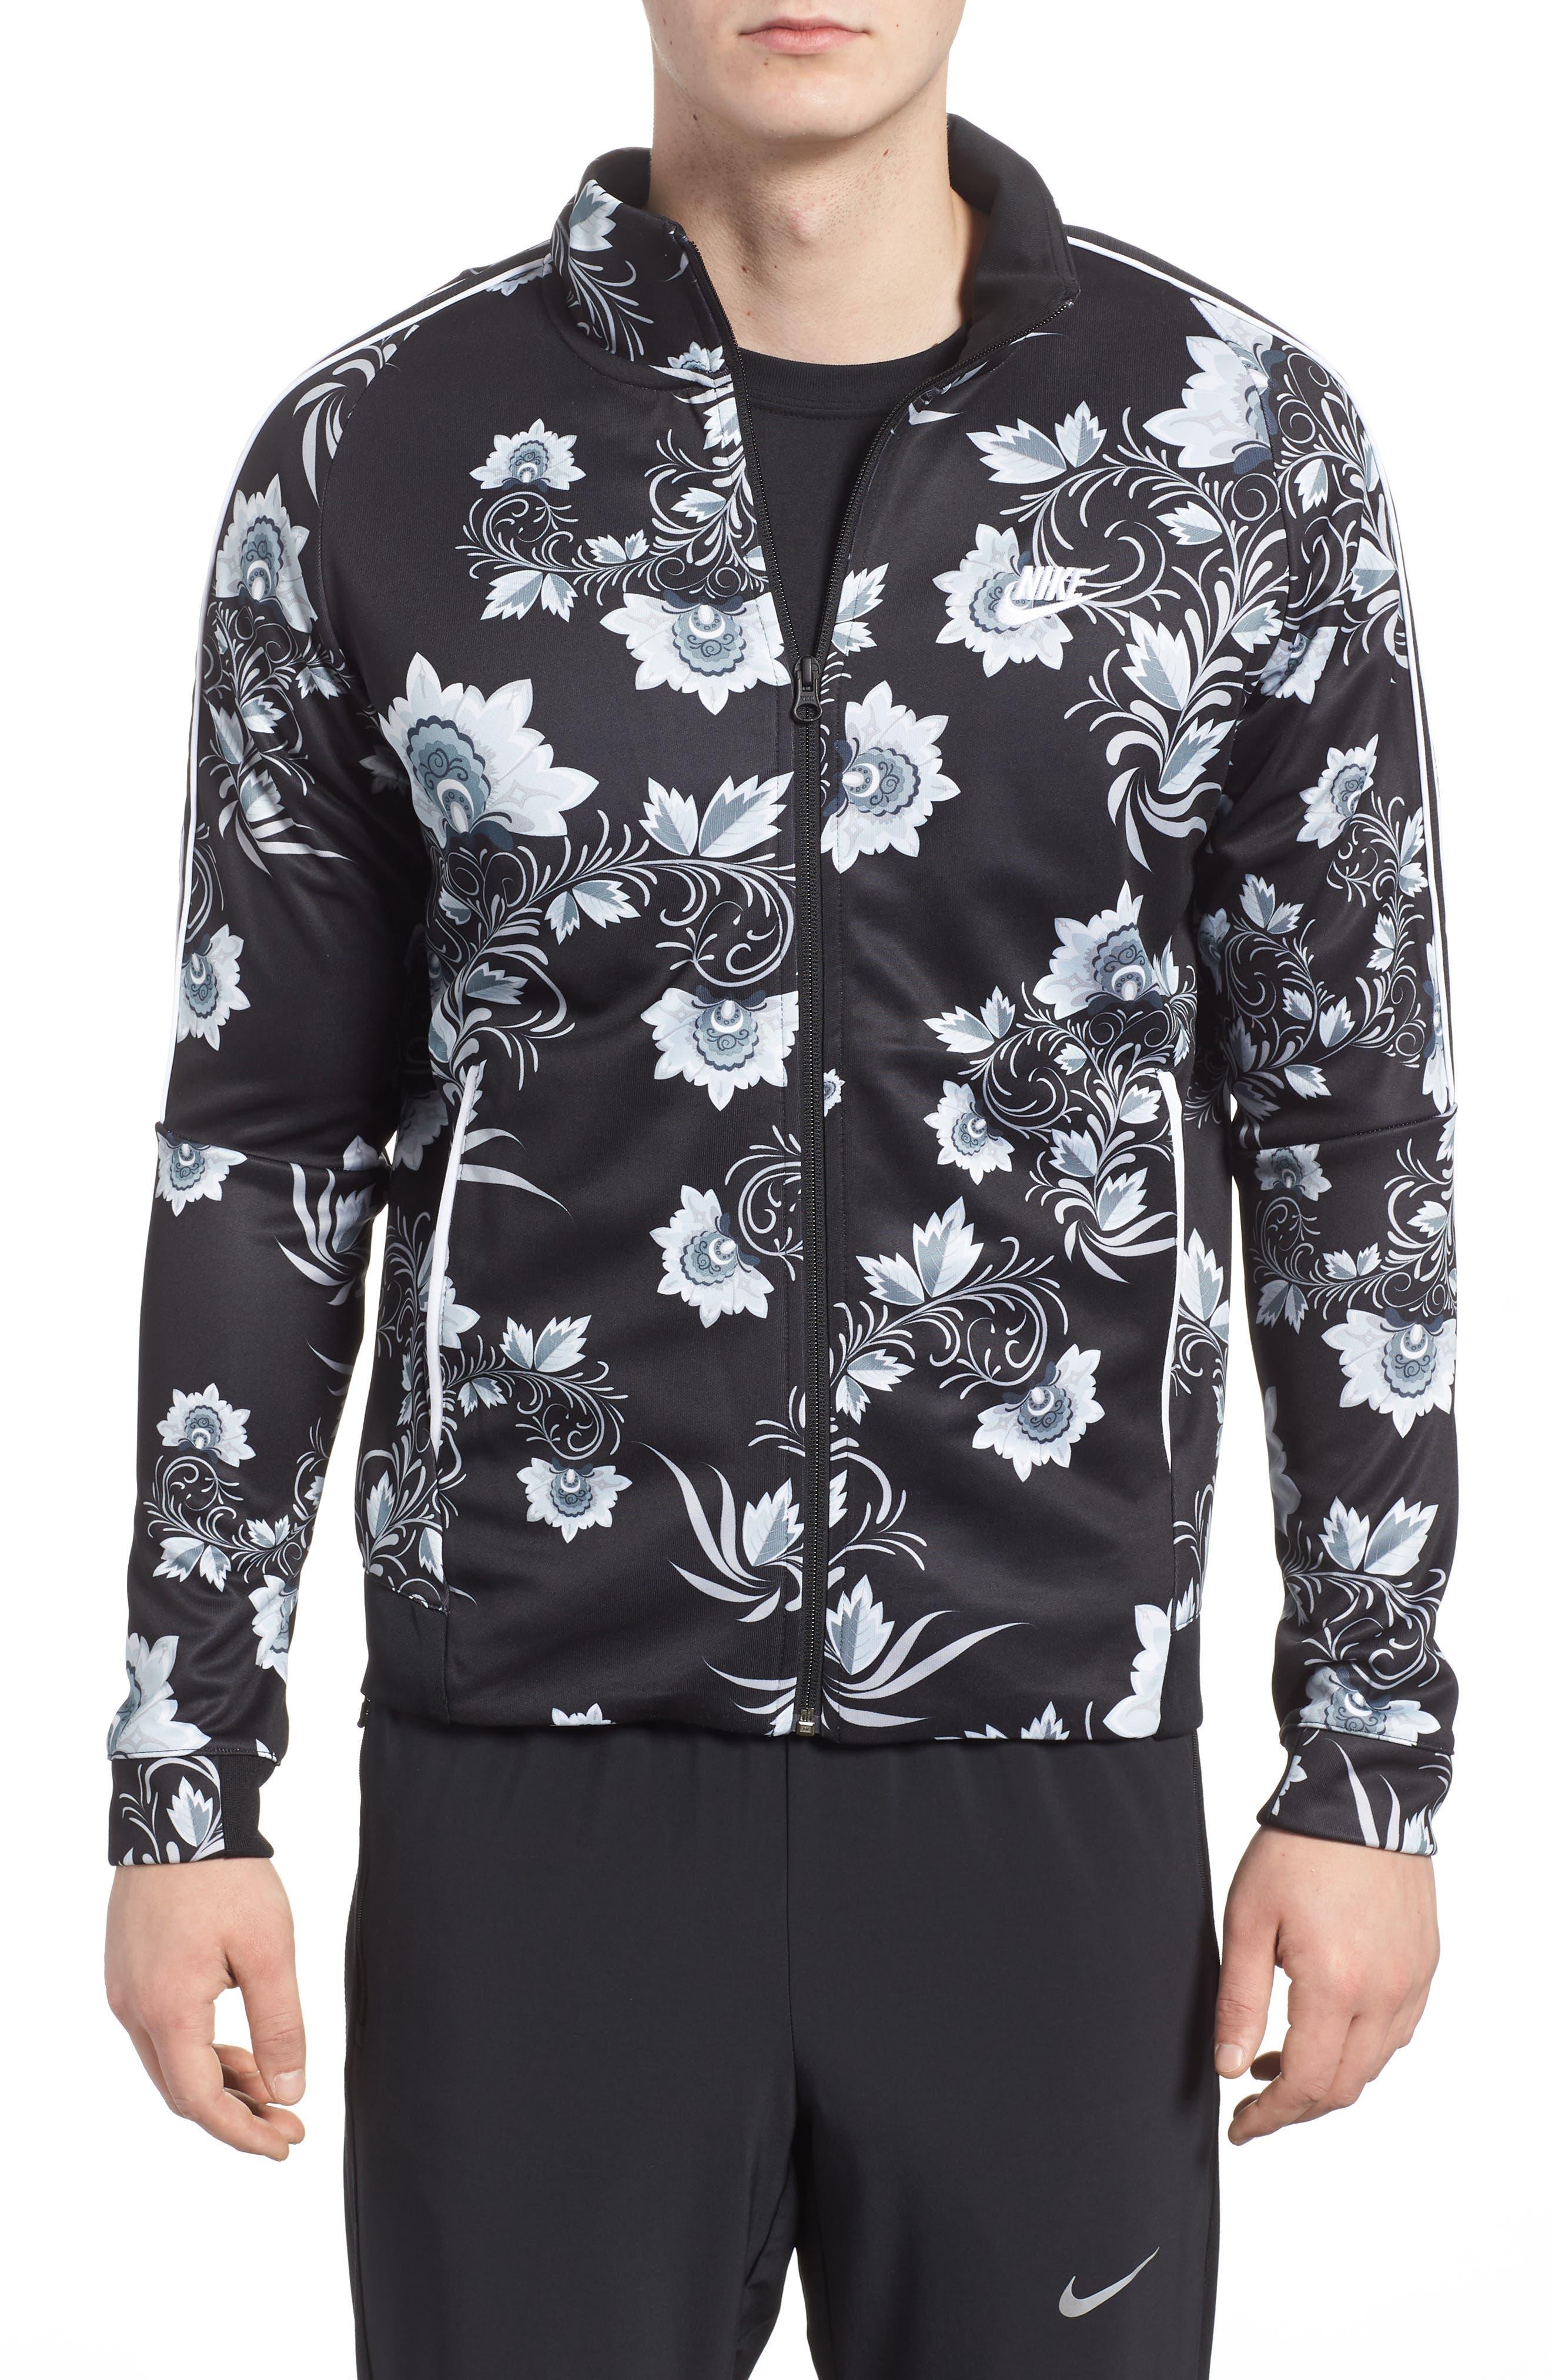 NSW Tribute Jacket,                         Main,                         color, White/ Black/ White